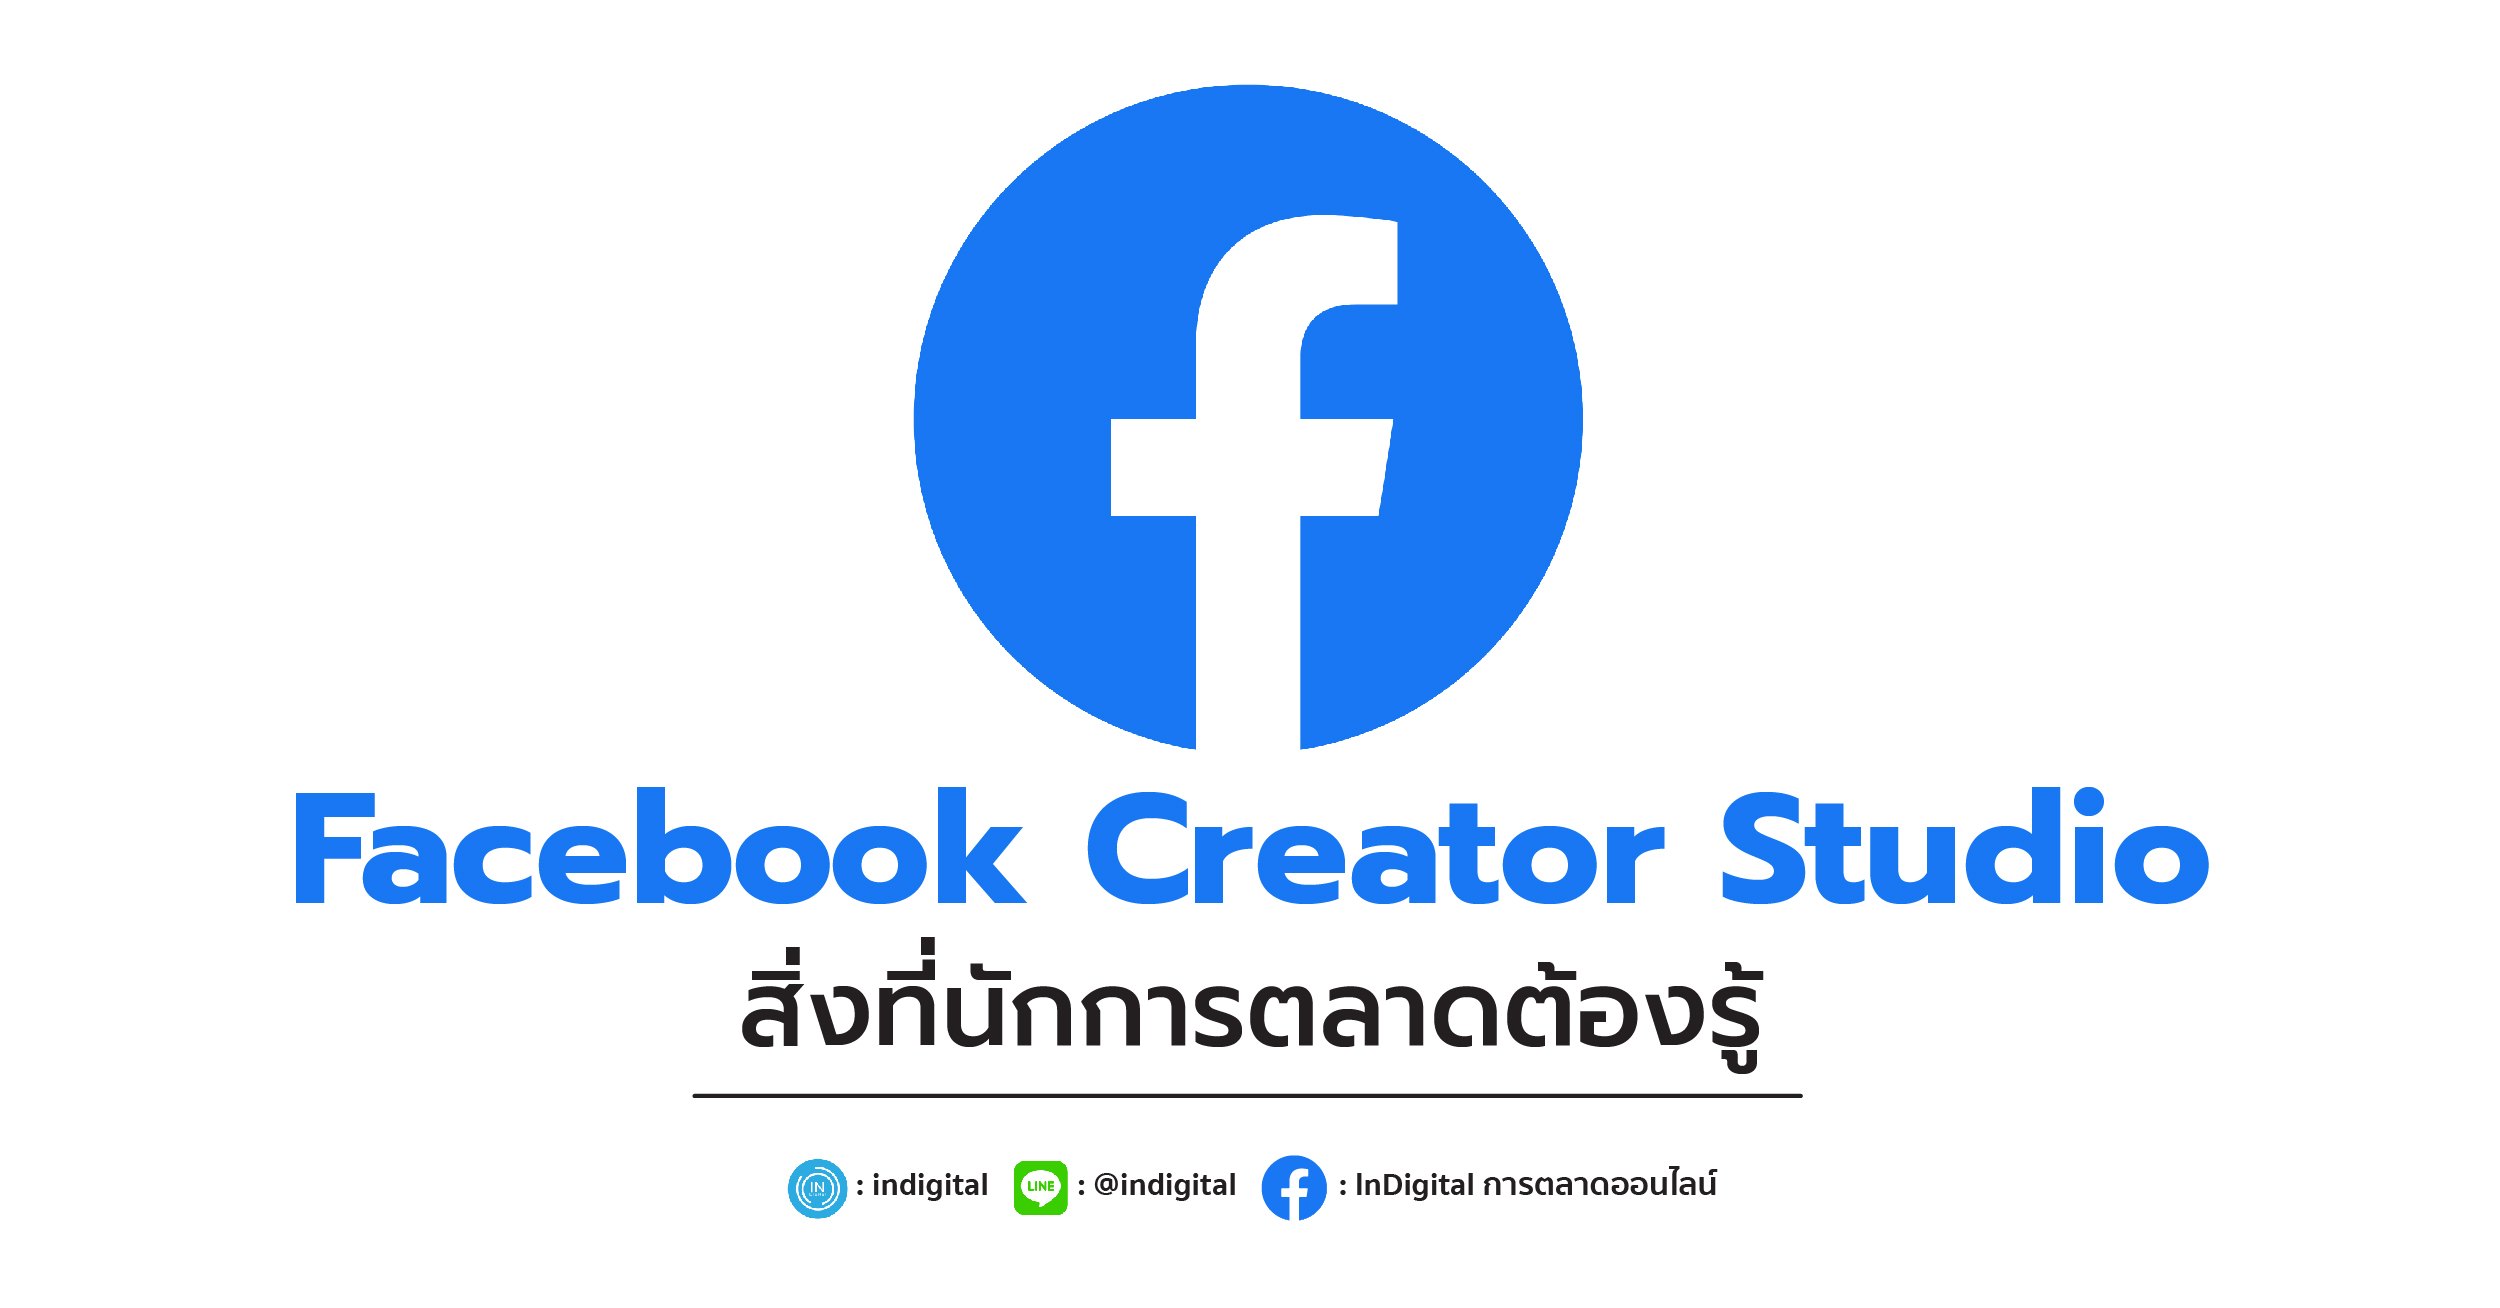 Facebook Creator Studio สิ่งที่นักการตลาดต้องรู้